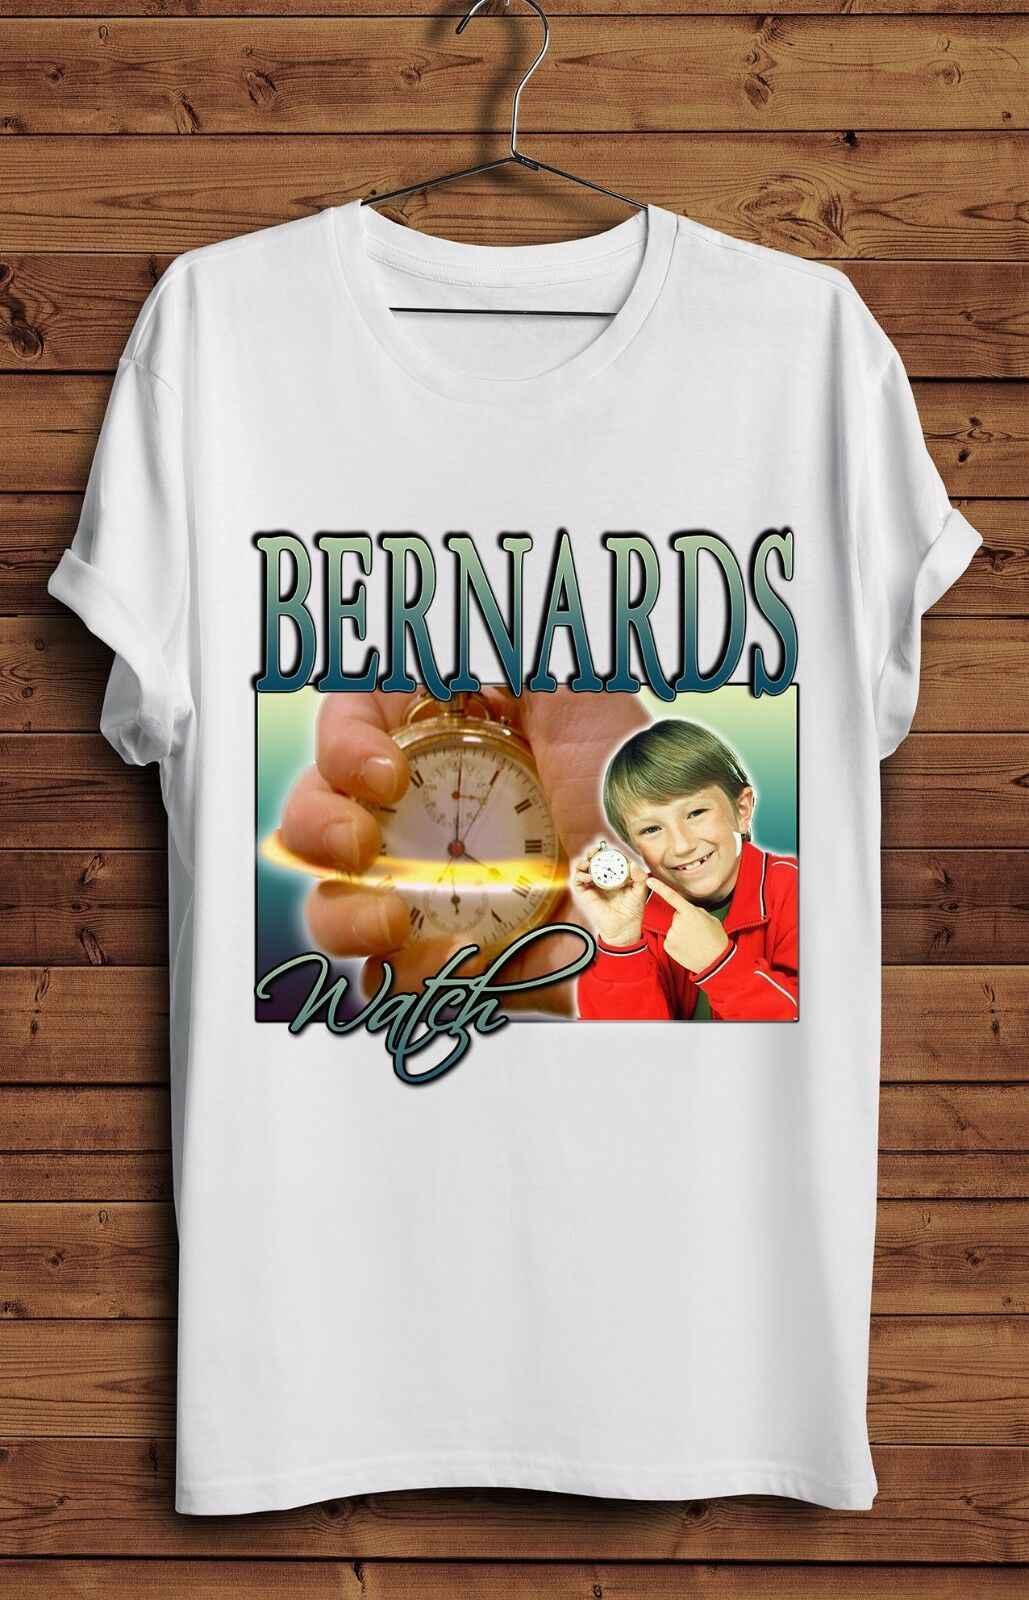 Bernards Orologio T Shirt Vintage Divertente Omaggio 90s TV Show Retro CBBC Tempo